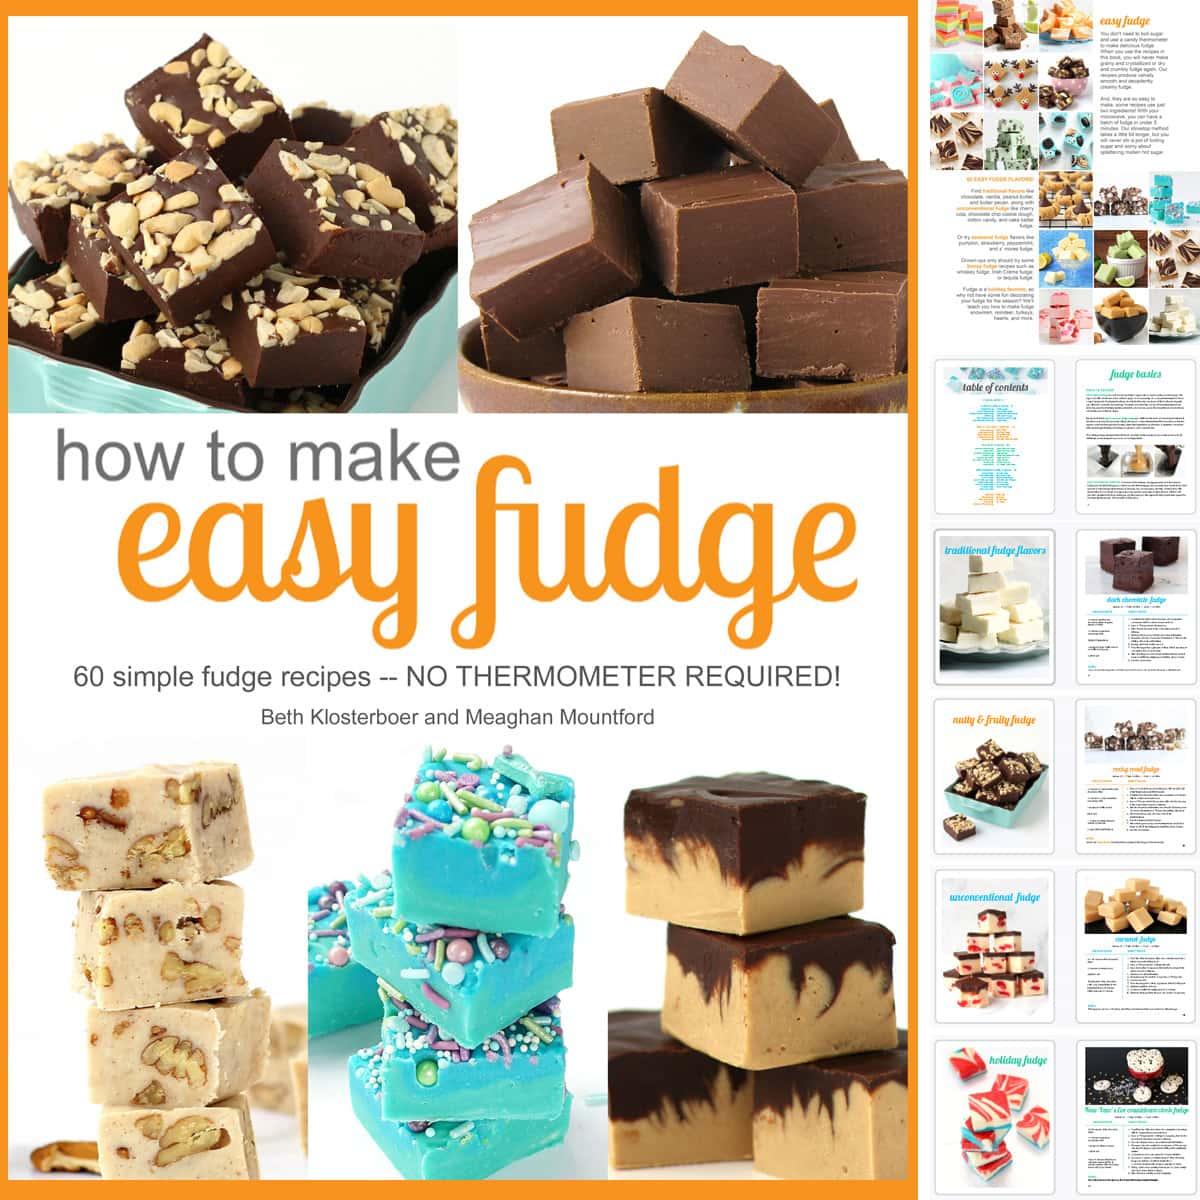 How To Make Easy Fudge Cookbook featuring chocolate cashew butter fudge, milk chocolate fudge, butter pecan fudge, mermaid fudge, and chocolate peanut butter fudge